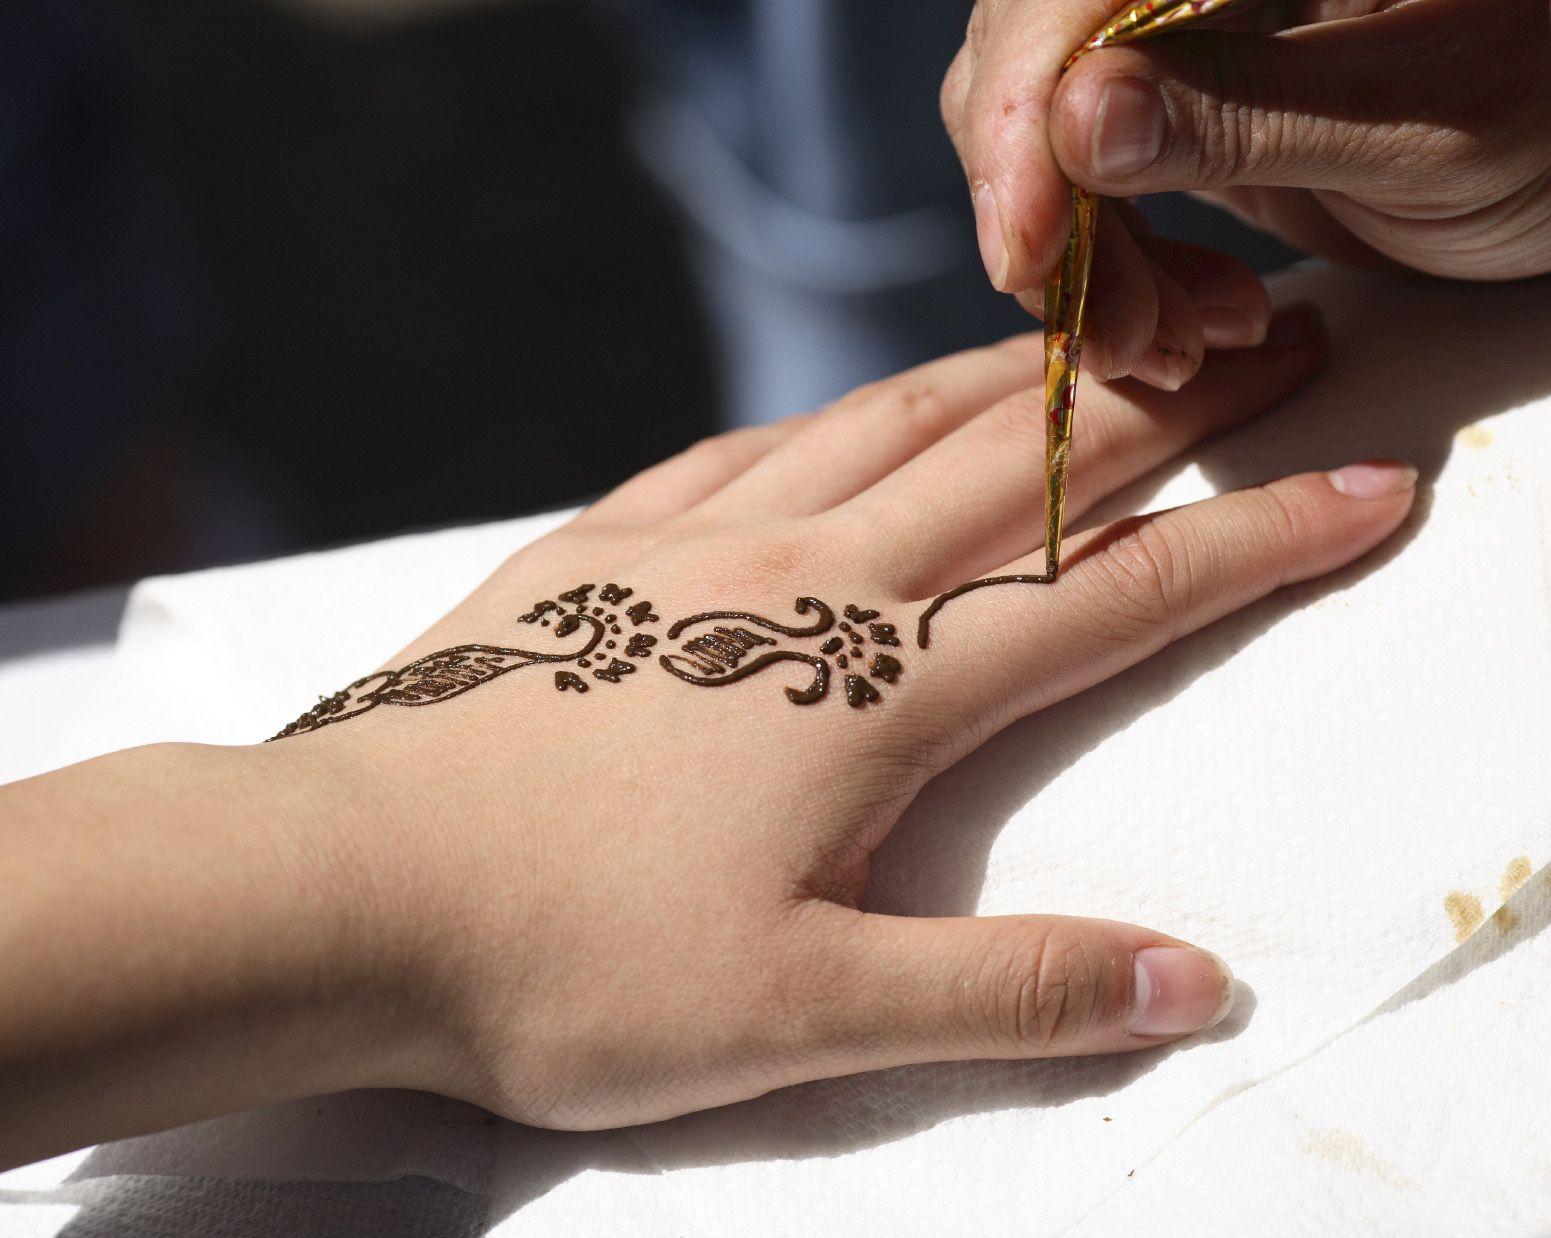 Henna Tattoo How To : Application henna hennas and tattoo